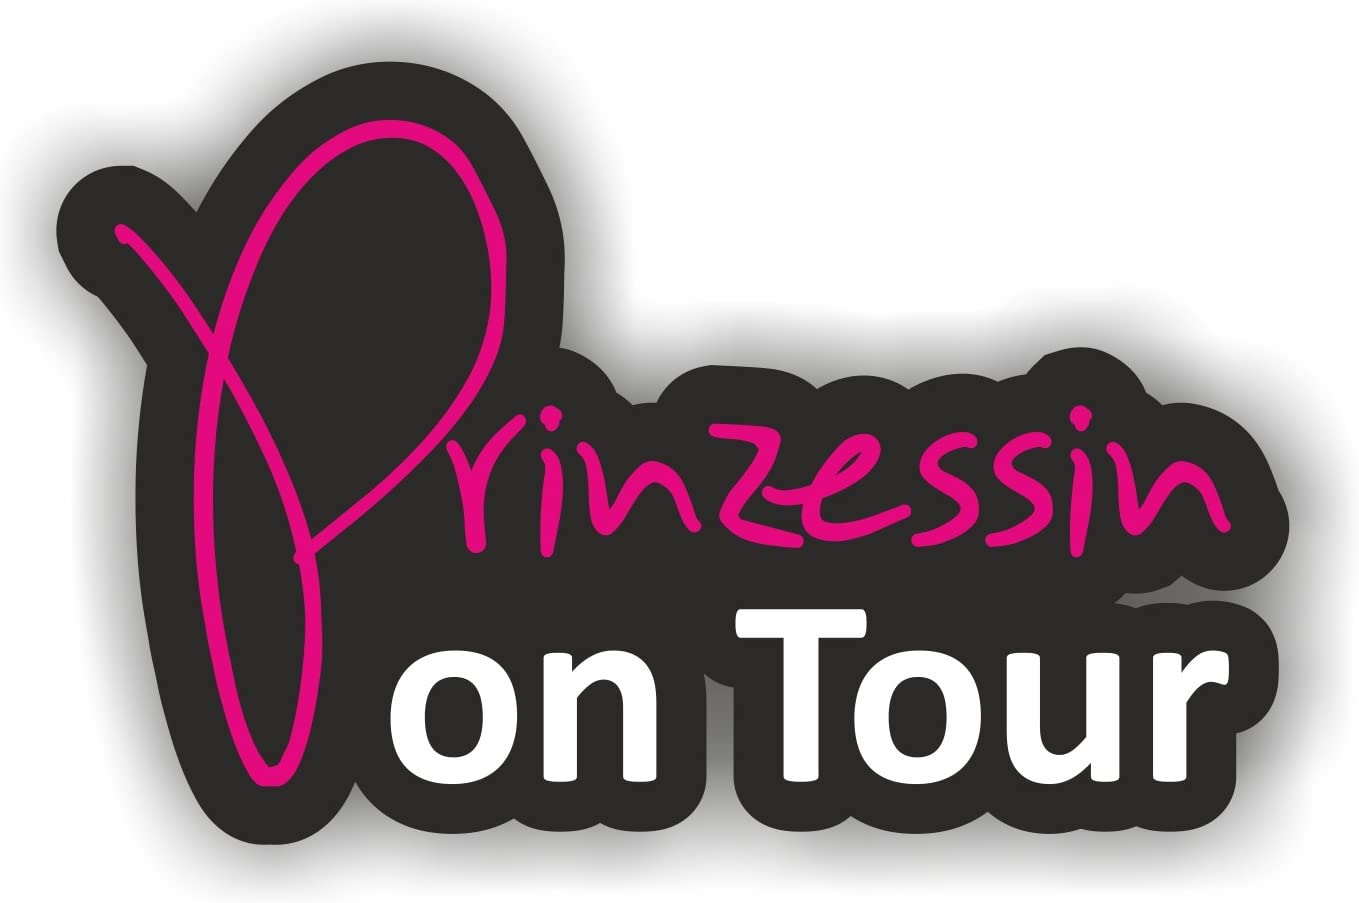 Folien Zentrum Prinzessin On Tour Shocker Hand Auto Aufkleber Jdm Tuning Oem Dub Decal Stickerbomb Bombing Fun W Auto